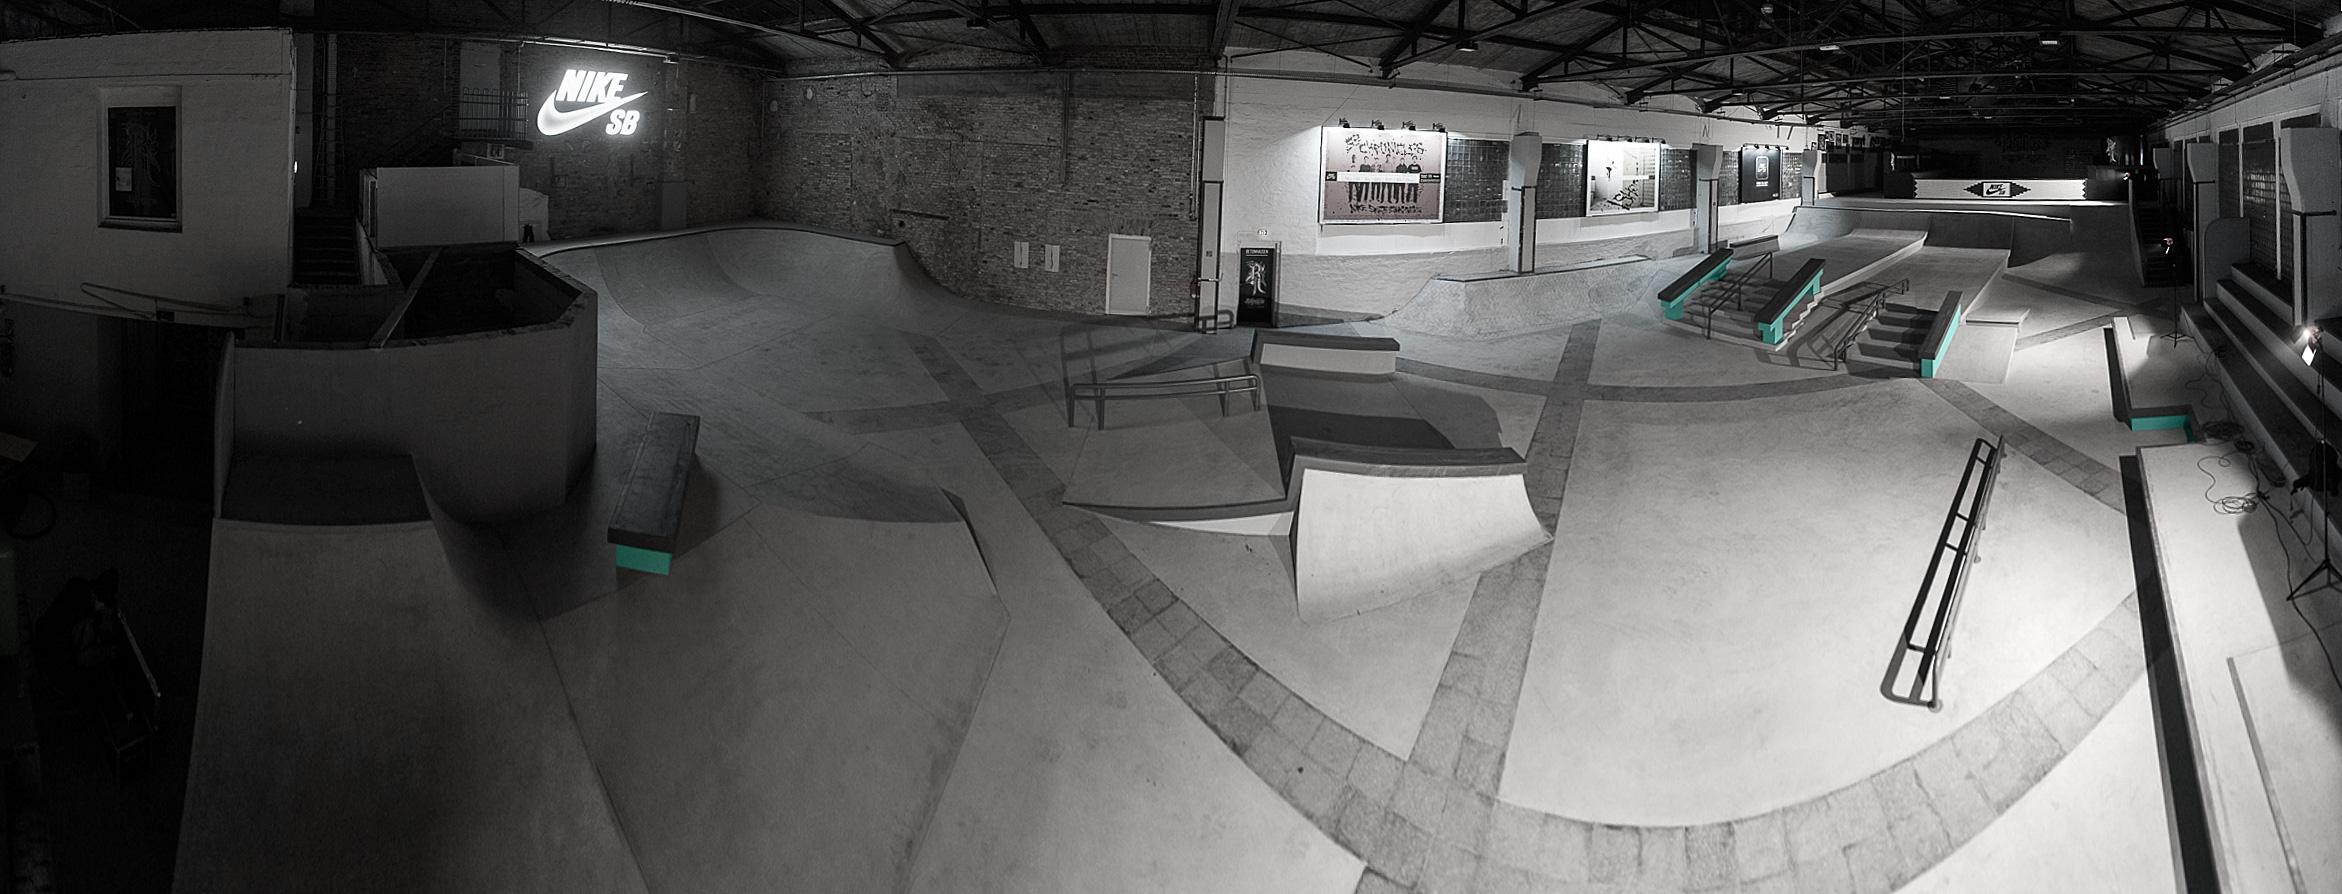 Nike SB Shelter – Panorama